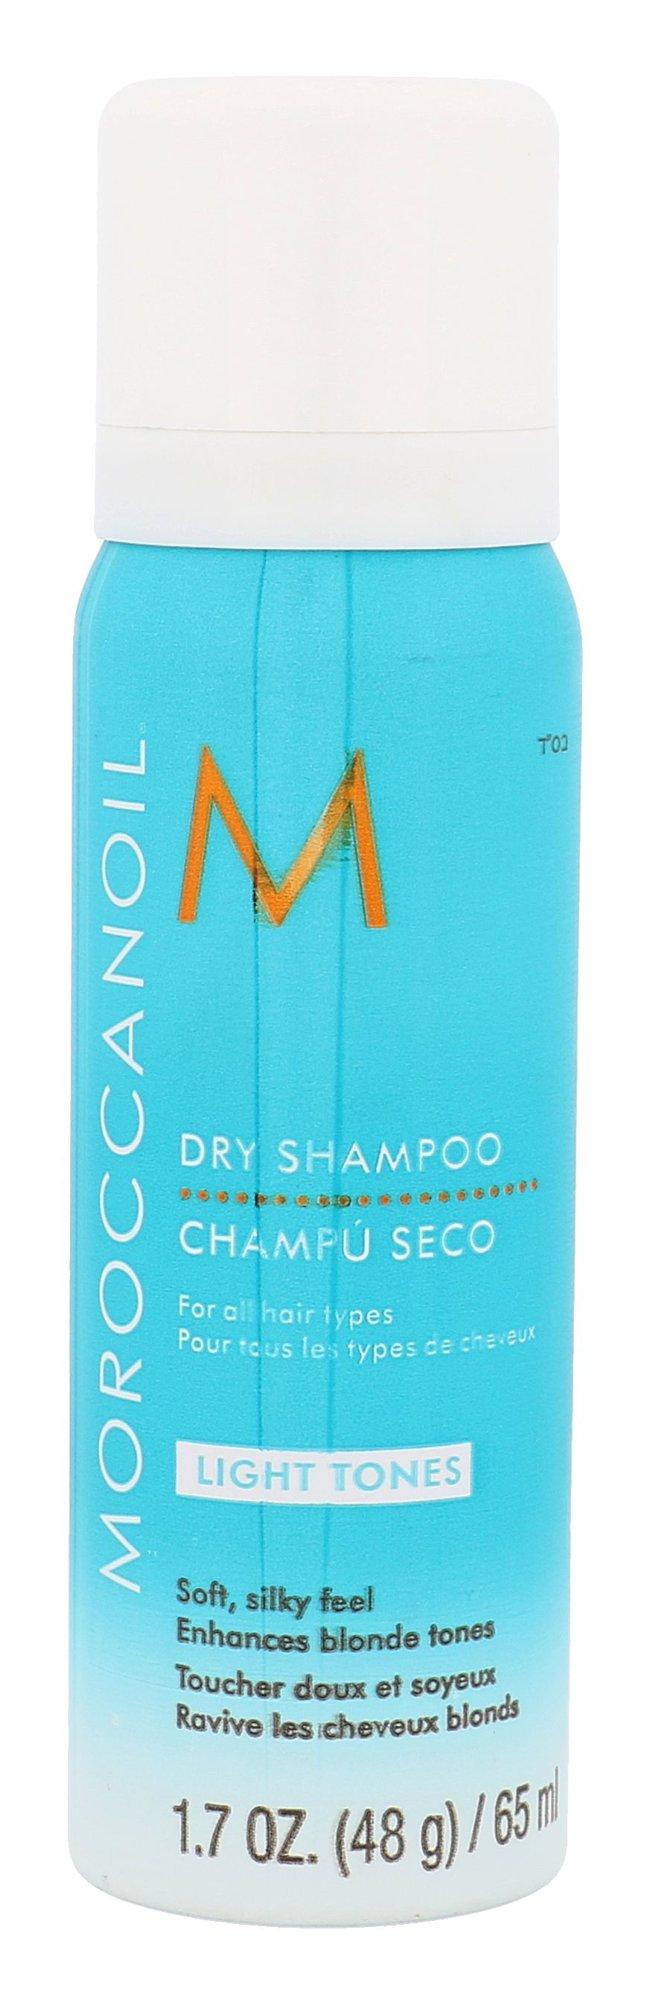 Moroccanoil Light Tones Dry Shampoo Cosmetic 65ml